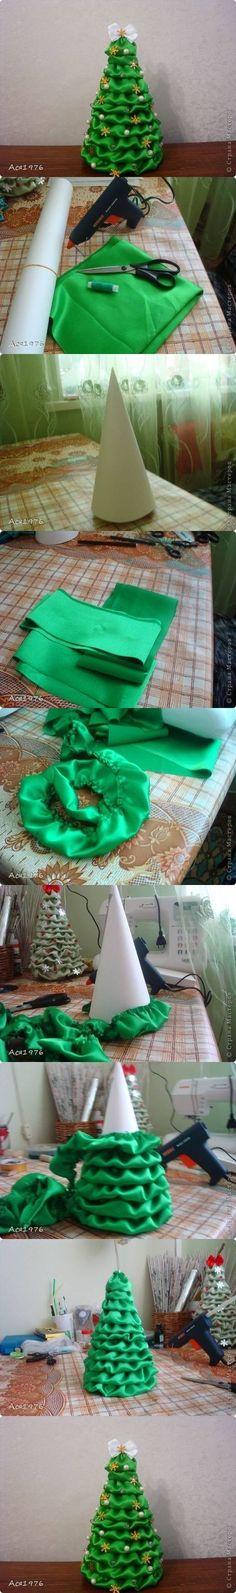 DIY Fabric Christmas Tree DIY Projects / UsefulDIY.com